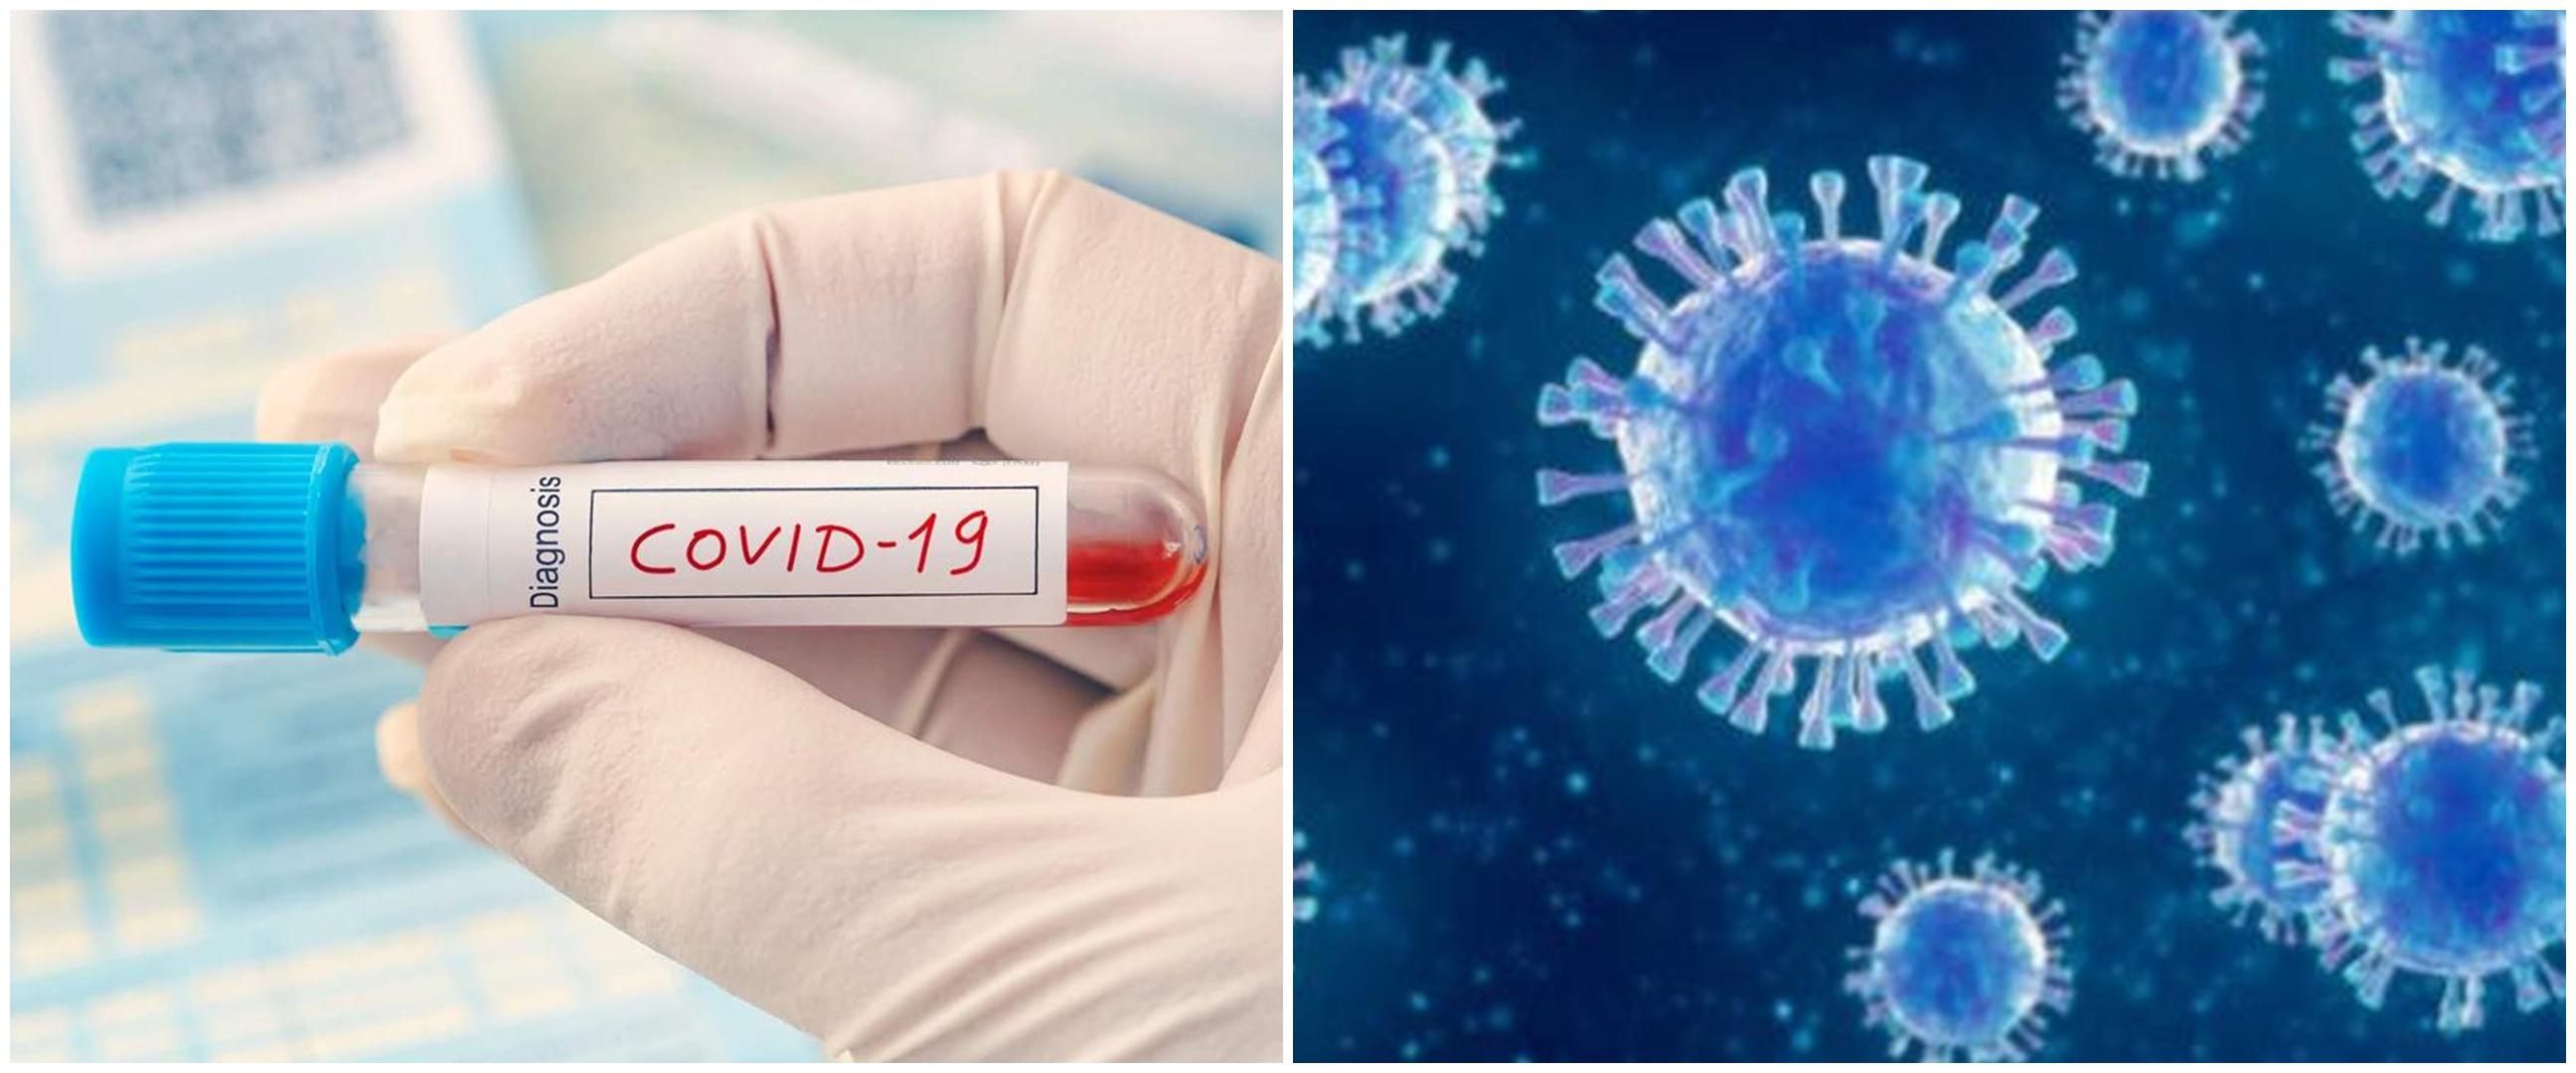 8 Miliarder baru yang ikut membantu lawan pandemi corona dunia